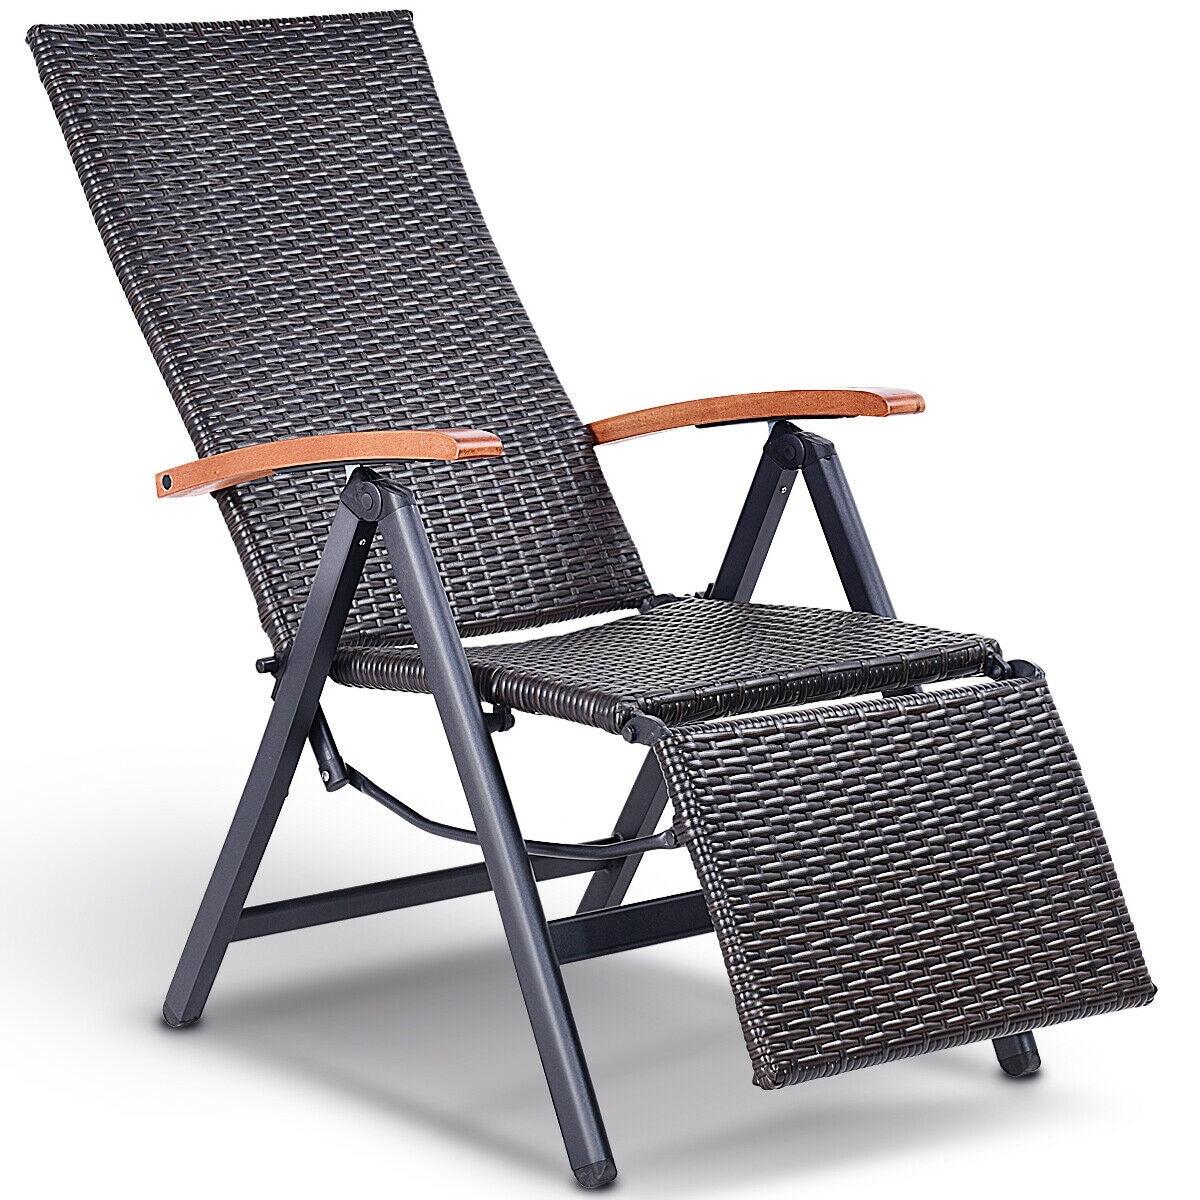 225 & Folding Chairs Garden \u0026 Patio | Shop our Best Home Goods Deals ...